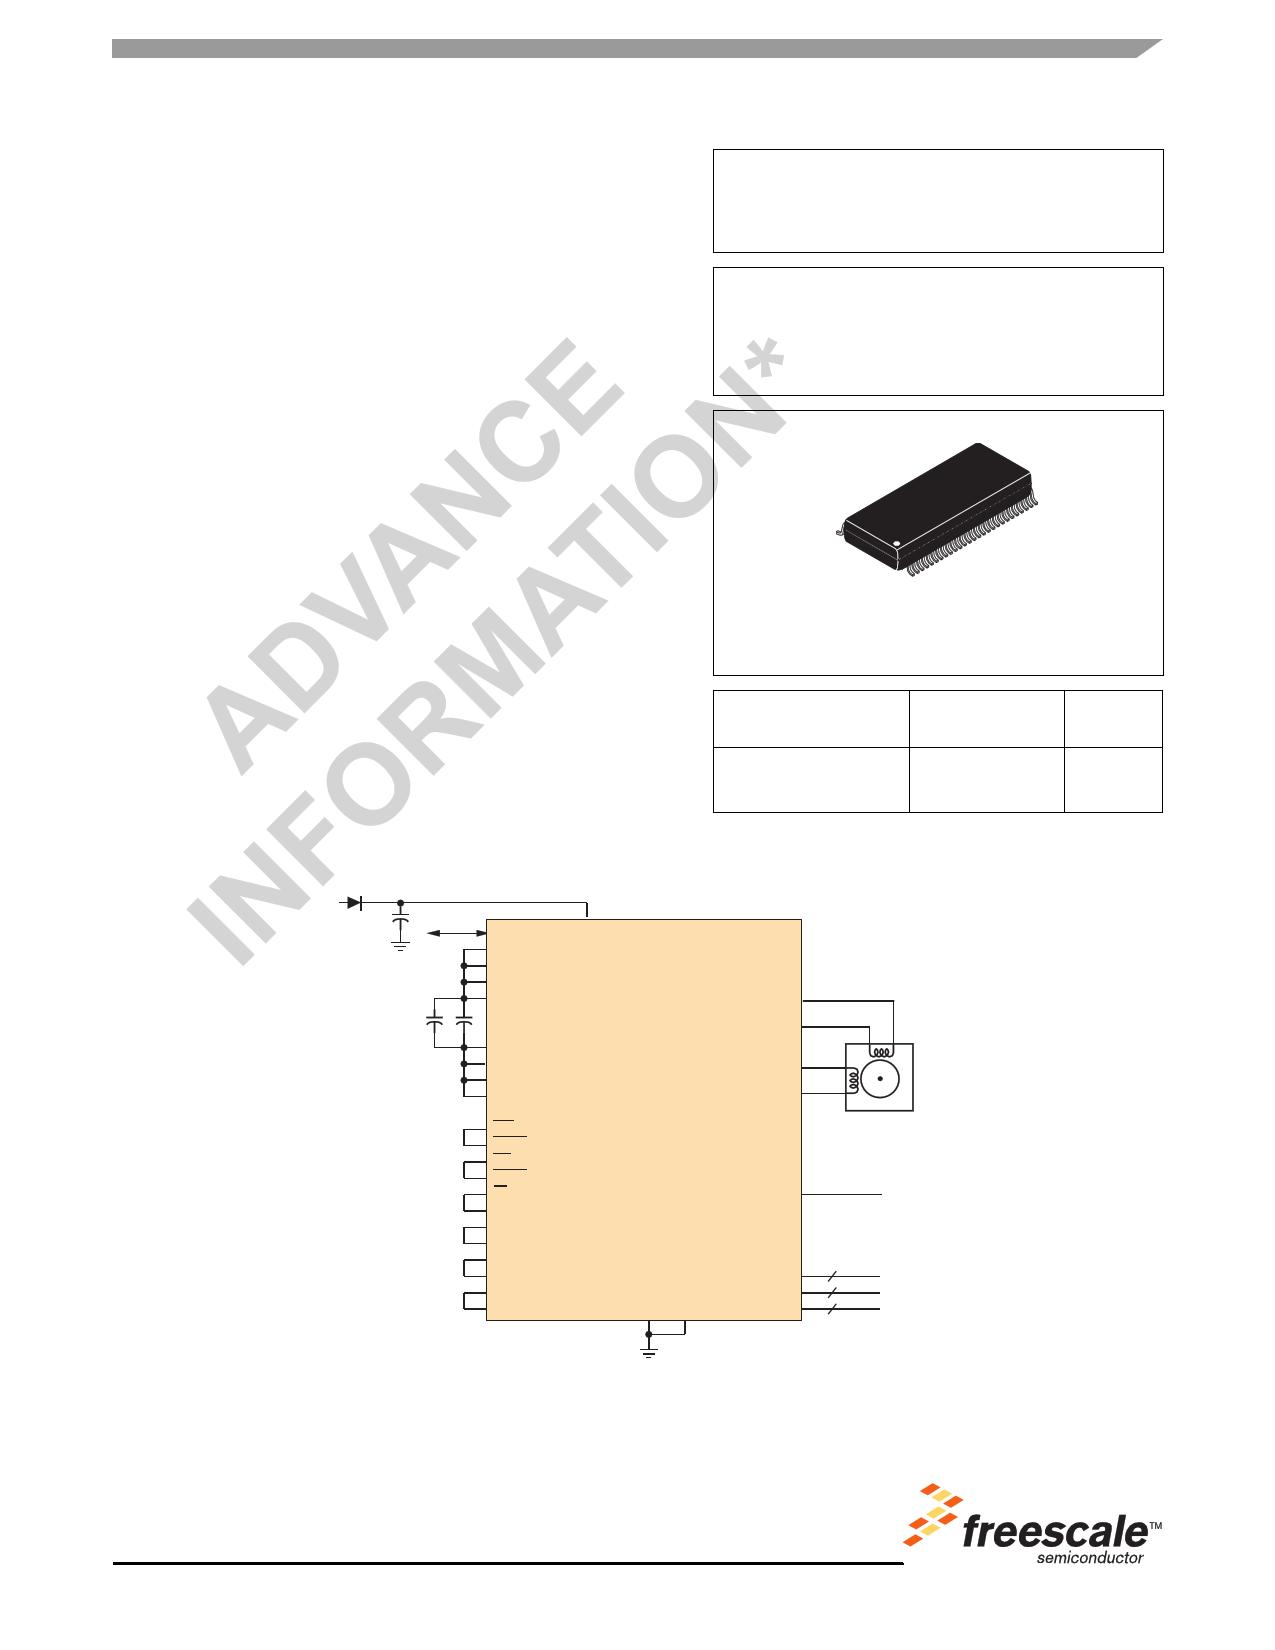 908E626 datasheet